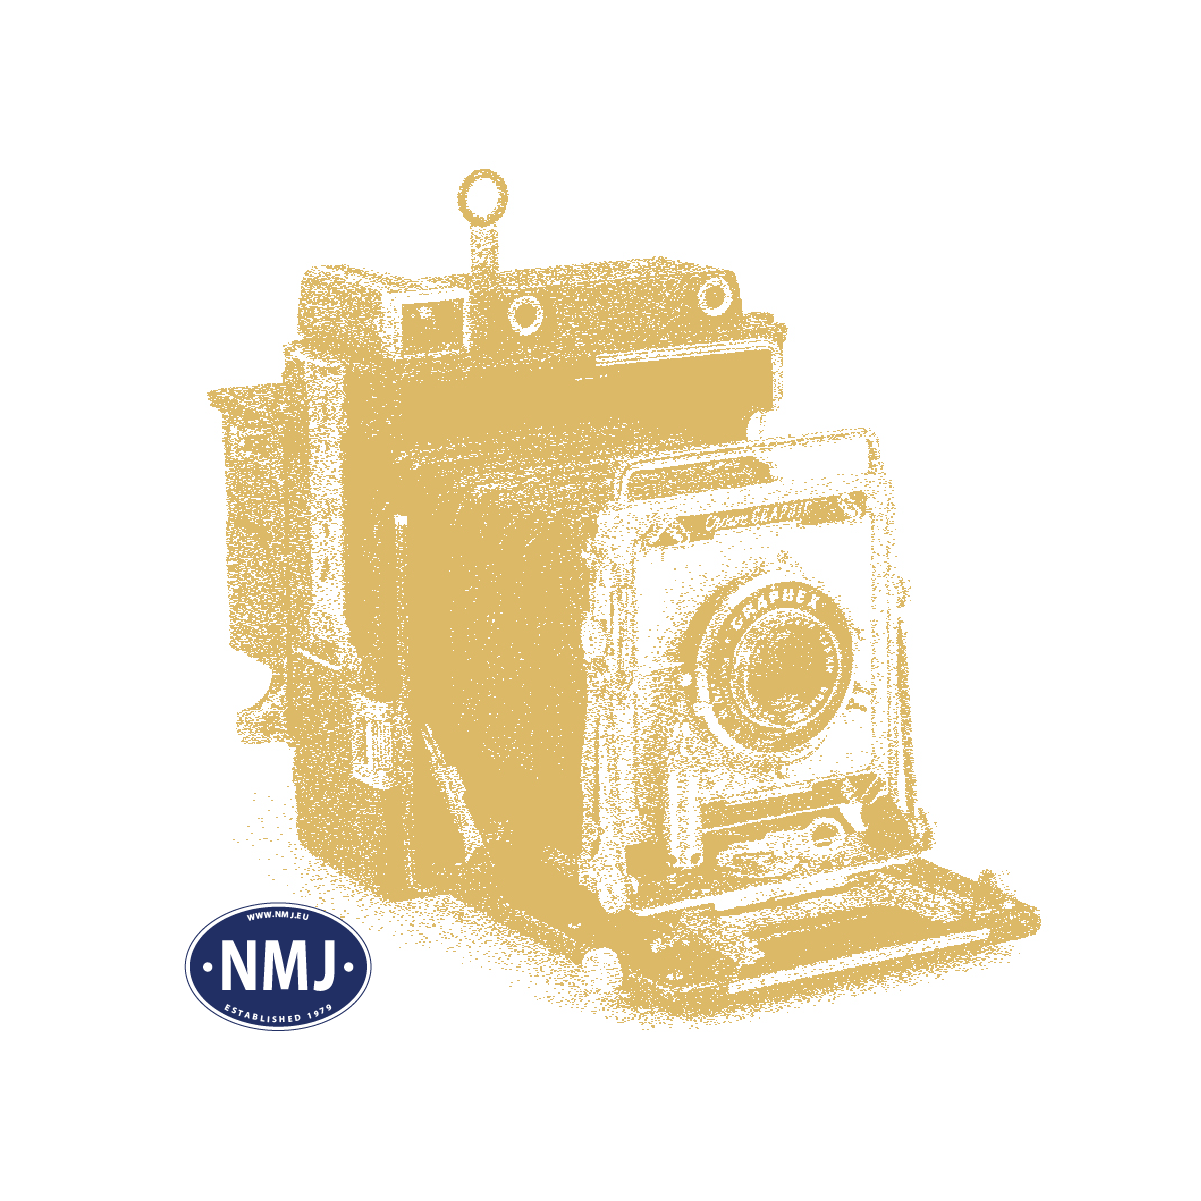 NMJT120.991 - NMJ Topline NSB B7 Strømopptak, 1 par (2 stk)